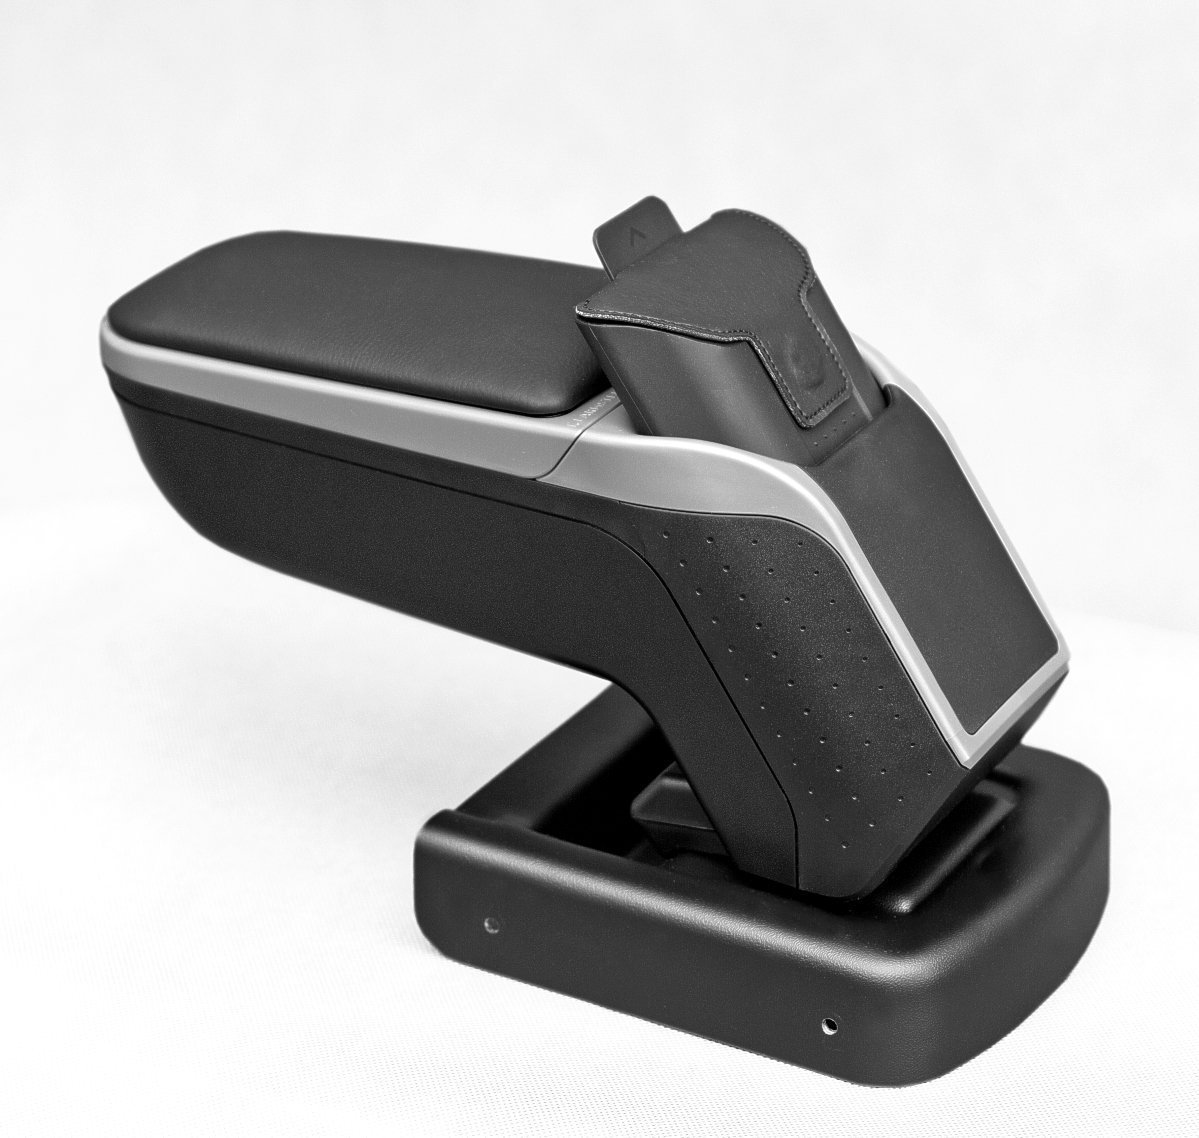 Armster 2 Premium Mittelarmlehne OPEL ASTRA H 03.04-11.09 silber 10316701